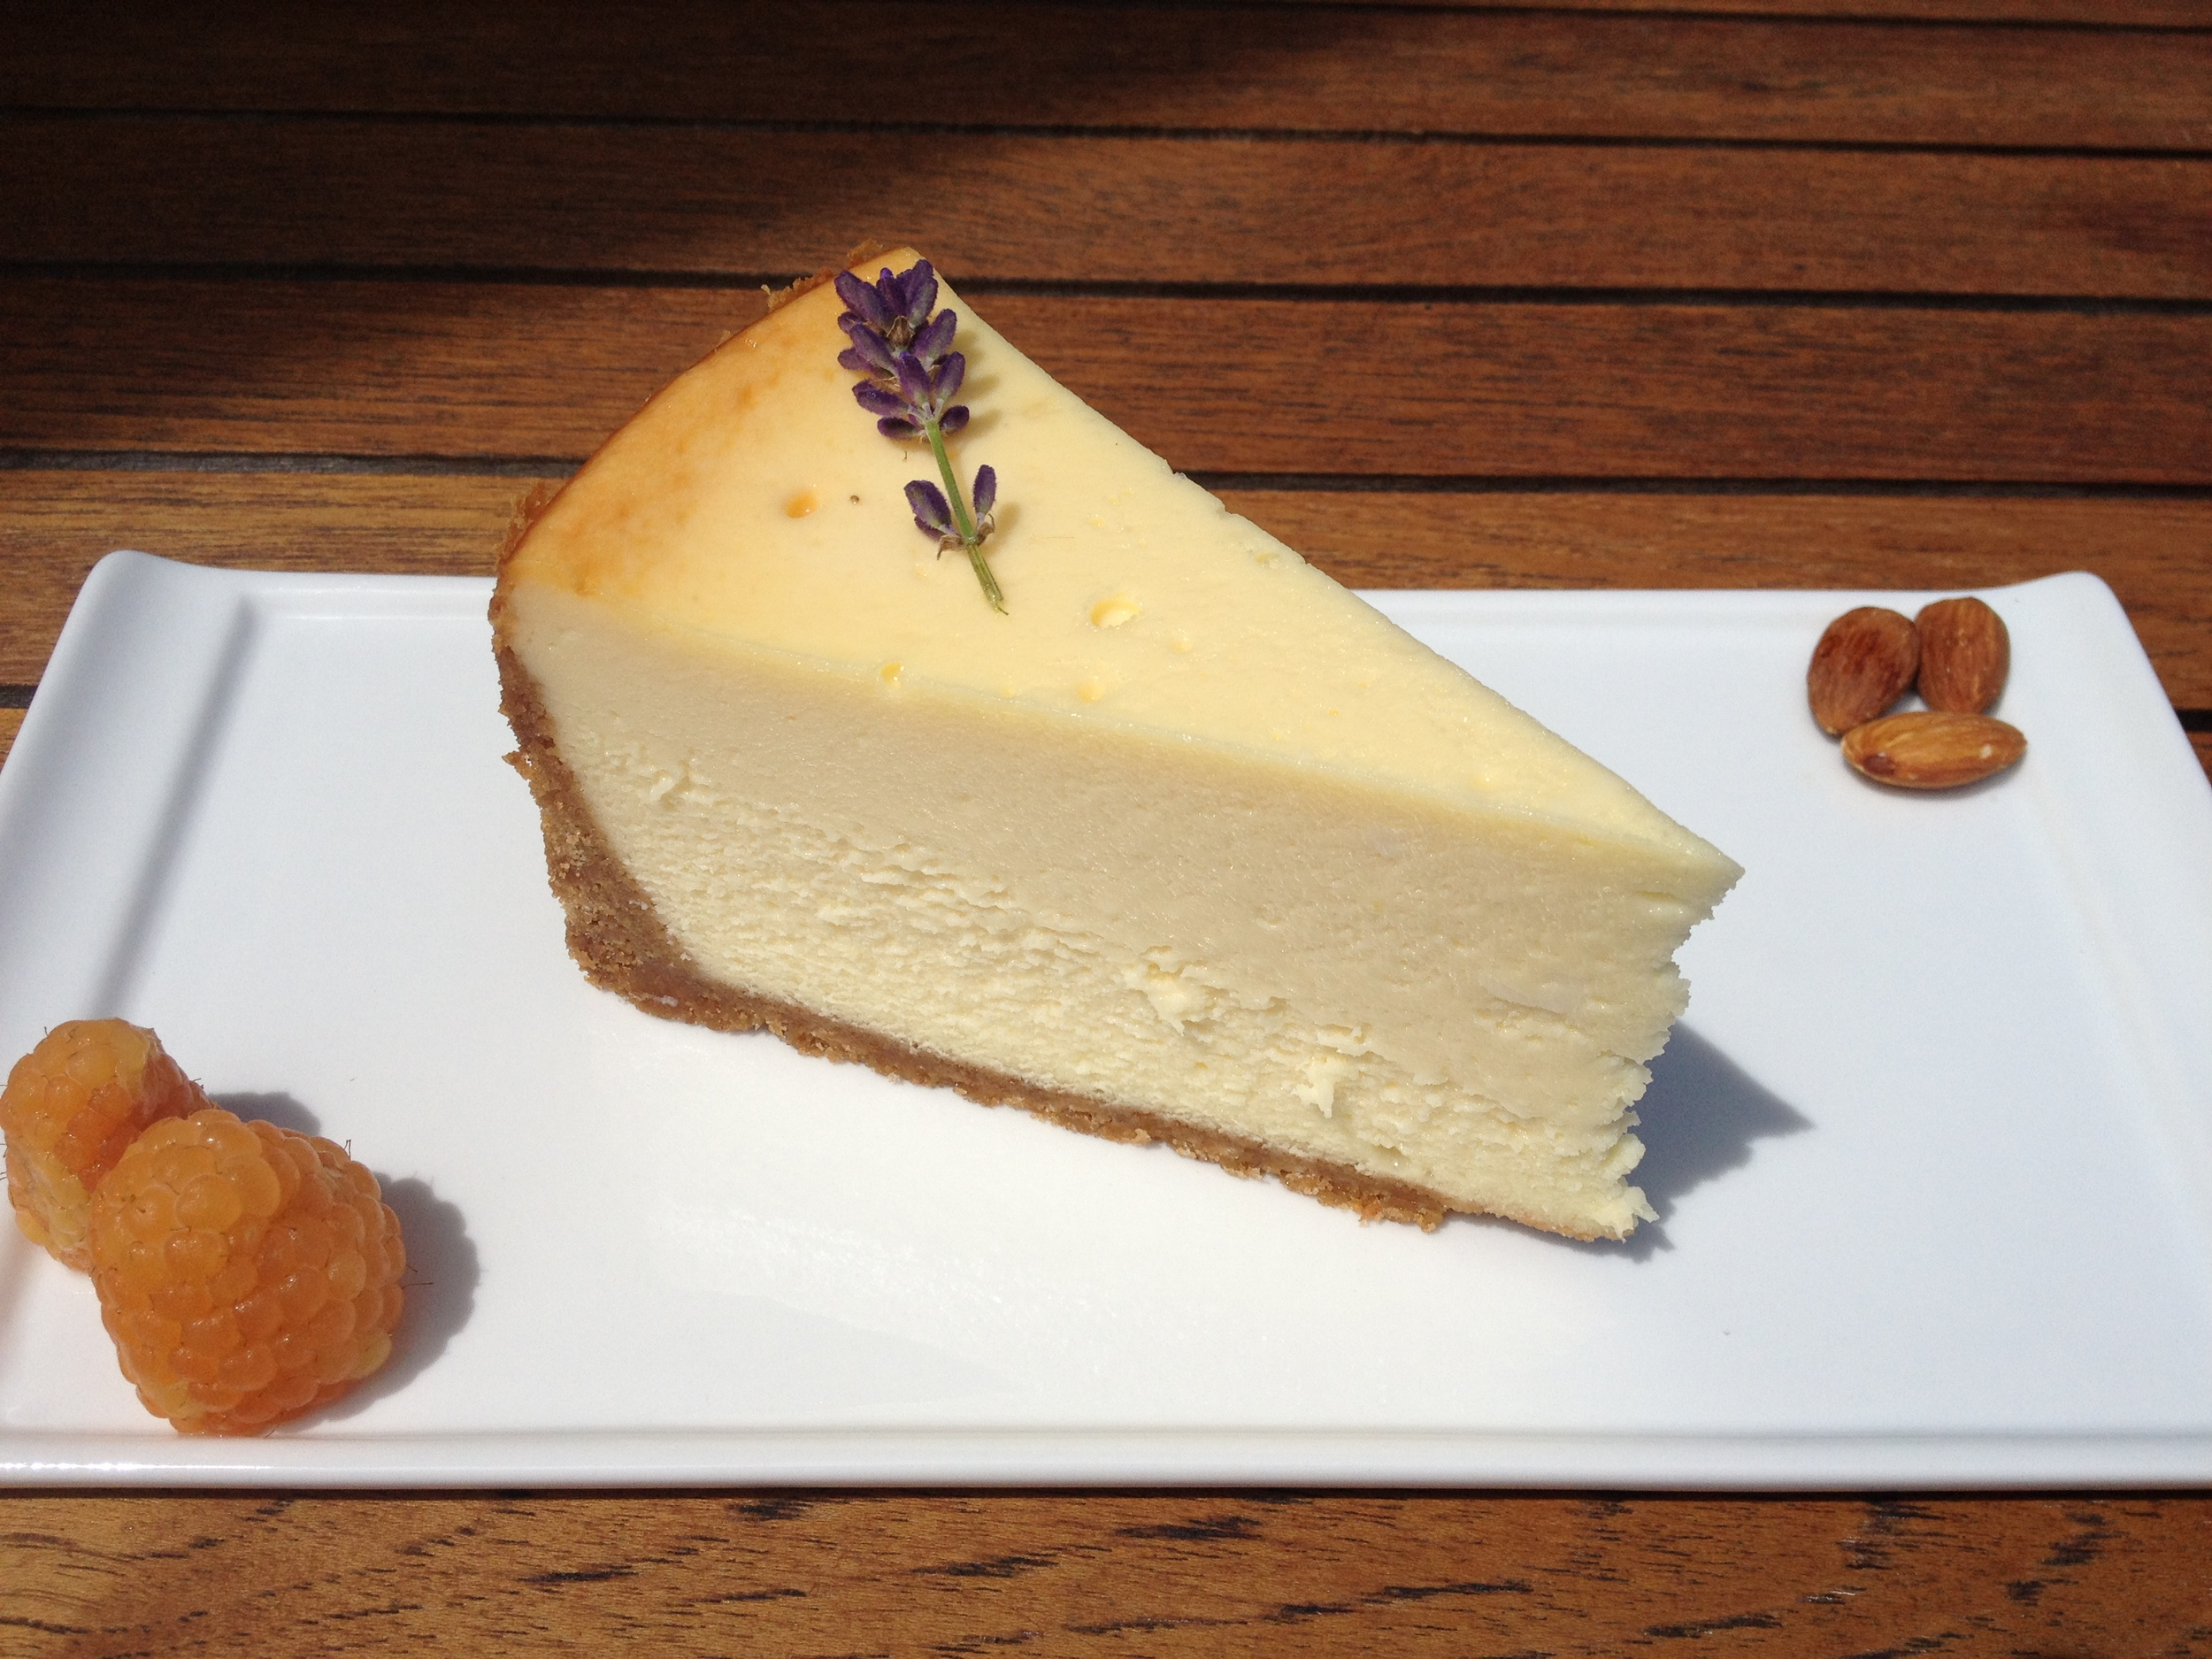 Housemade Almond Cheesecake with graham cracker crust.